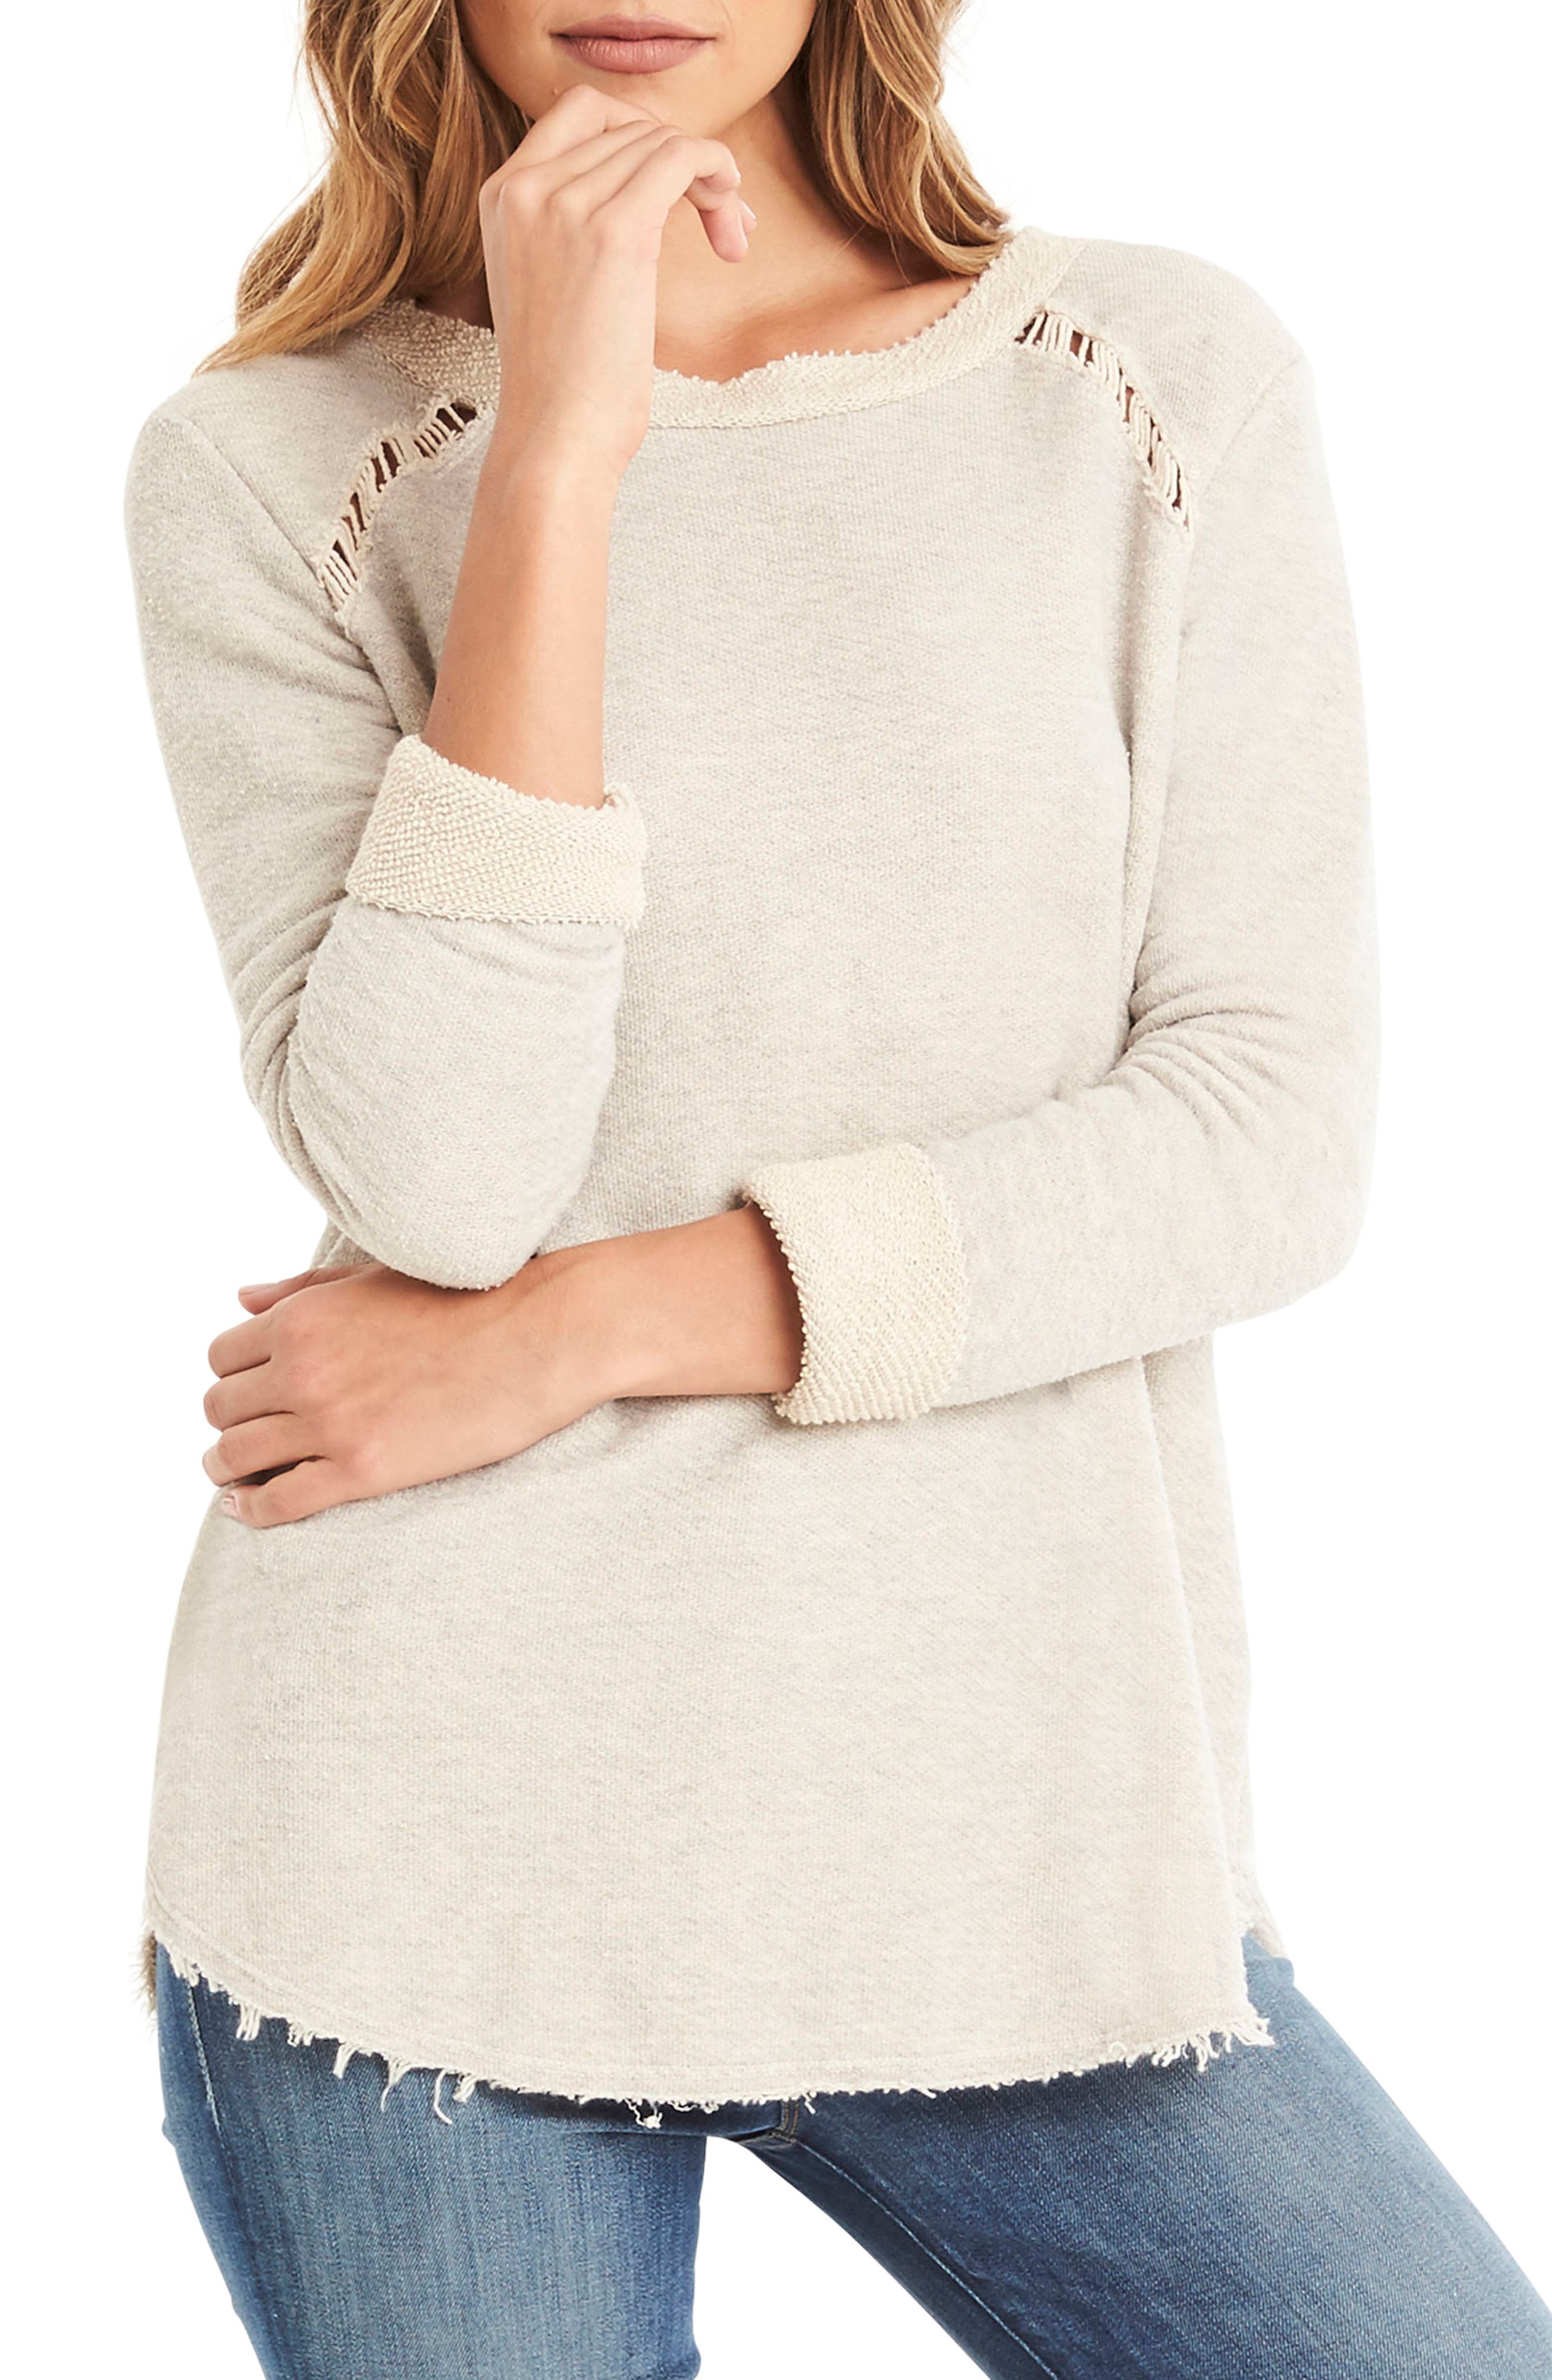 Distressed Sweatshirt,                             Main thumbnail 1, color,                             Chalk